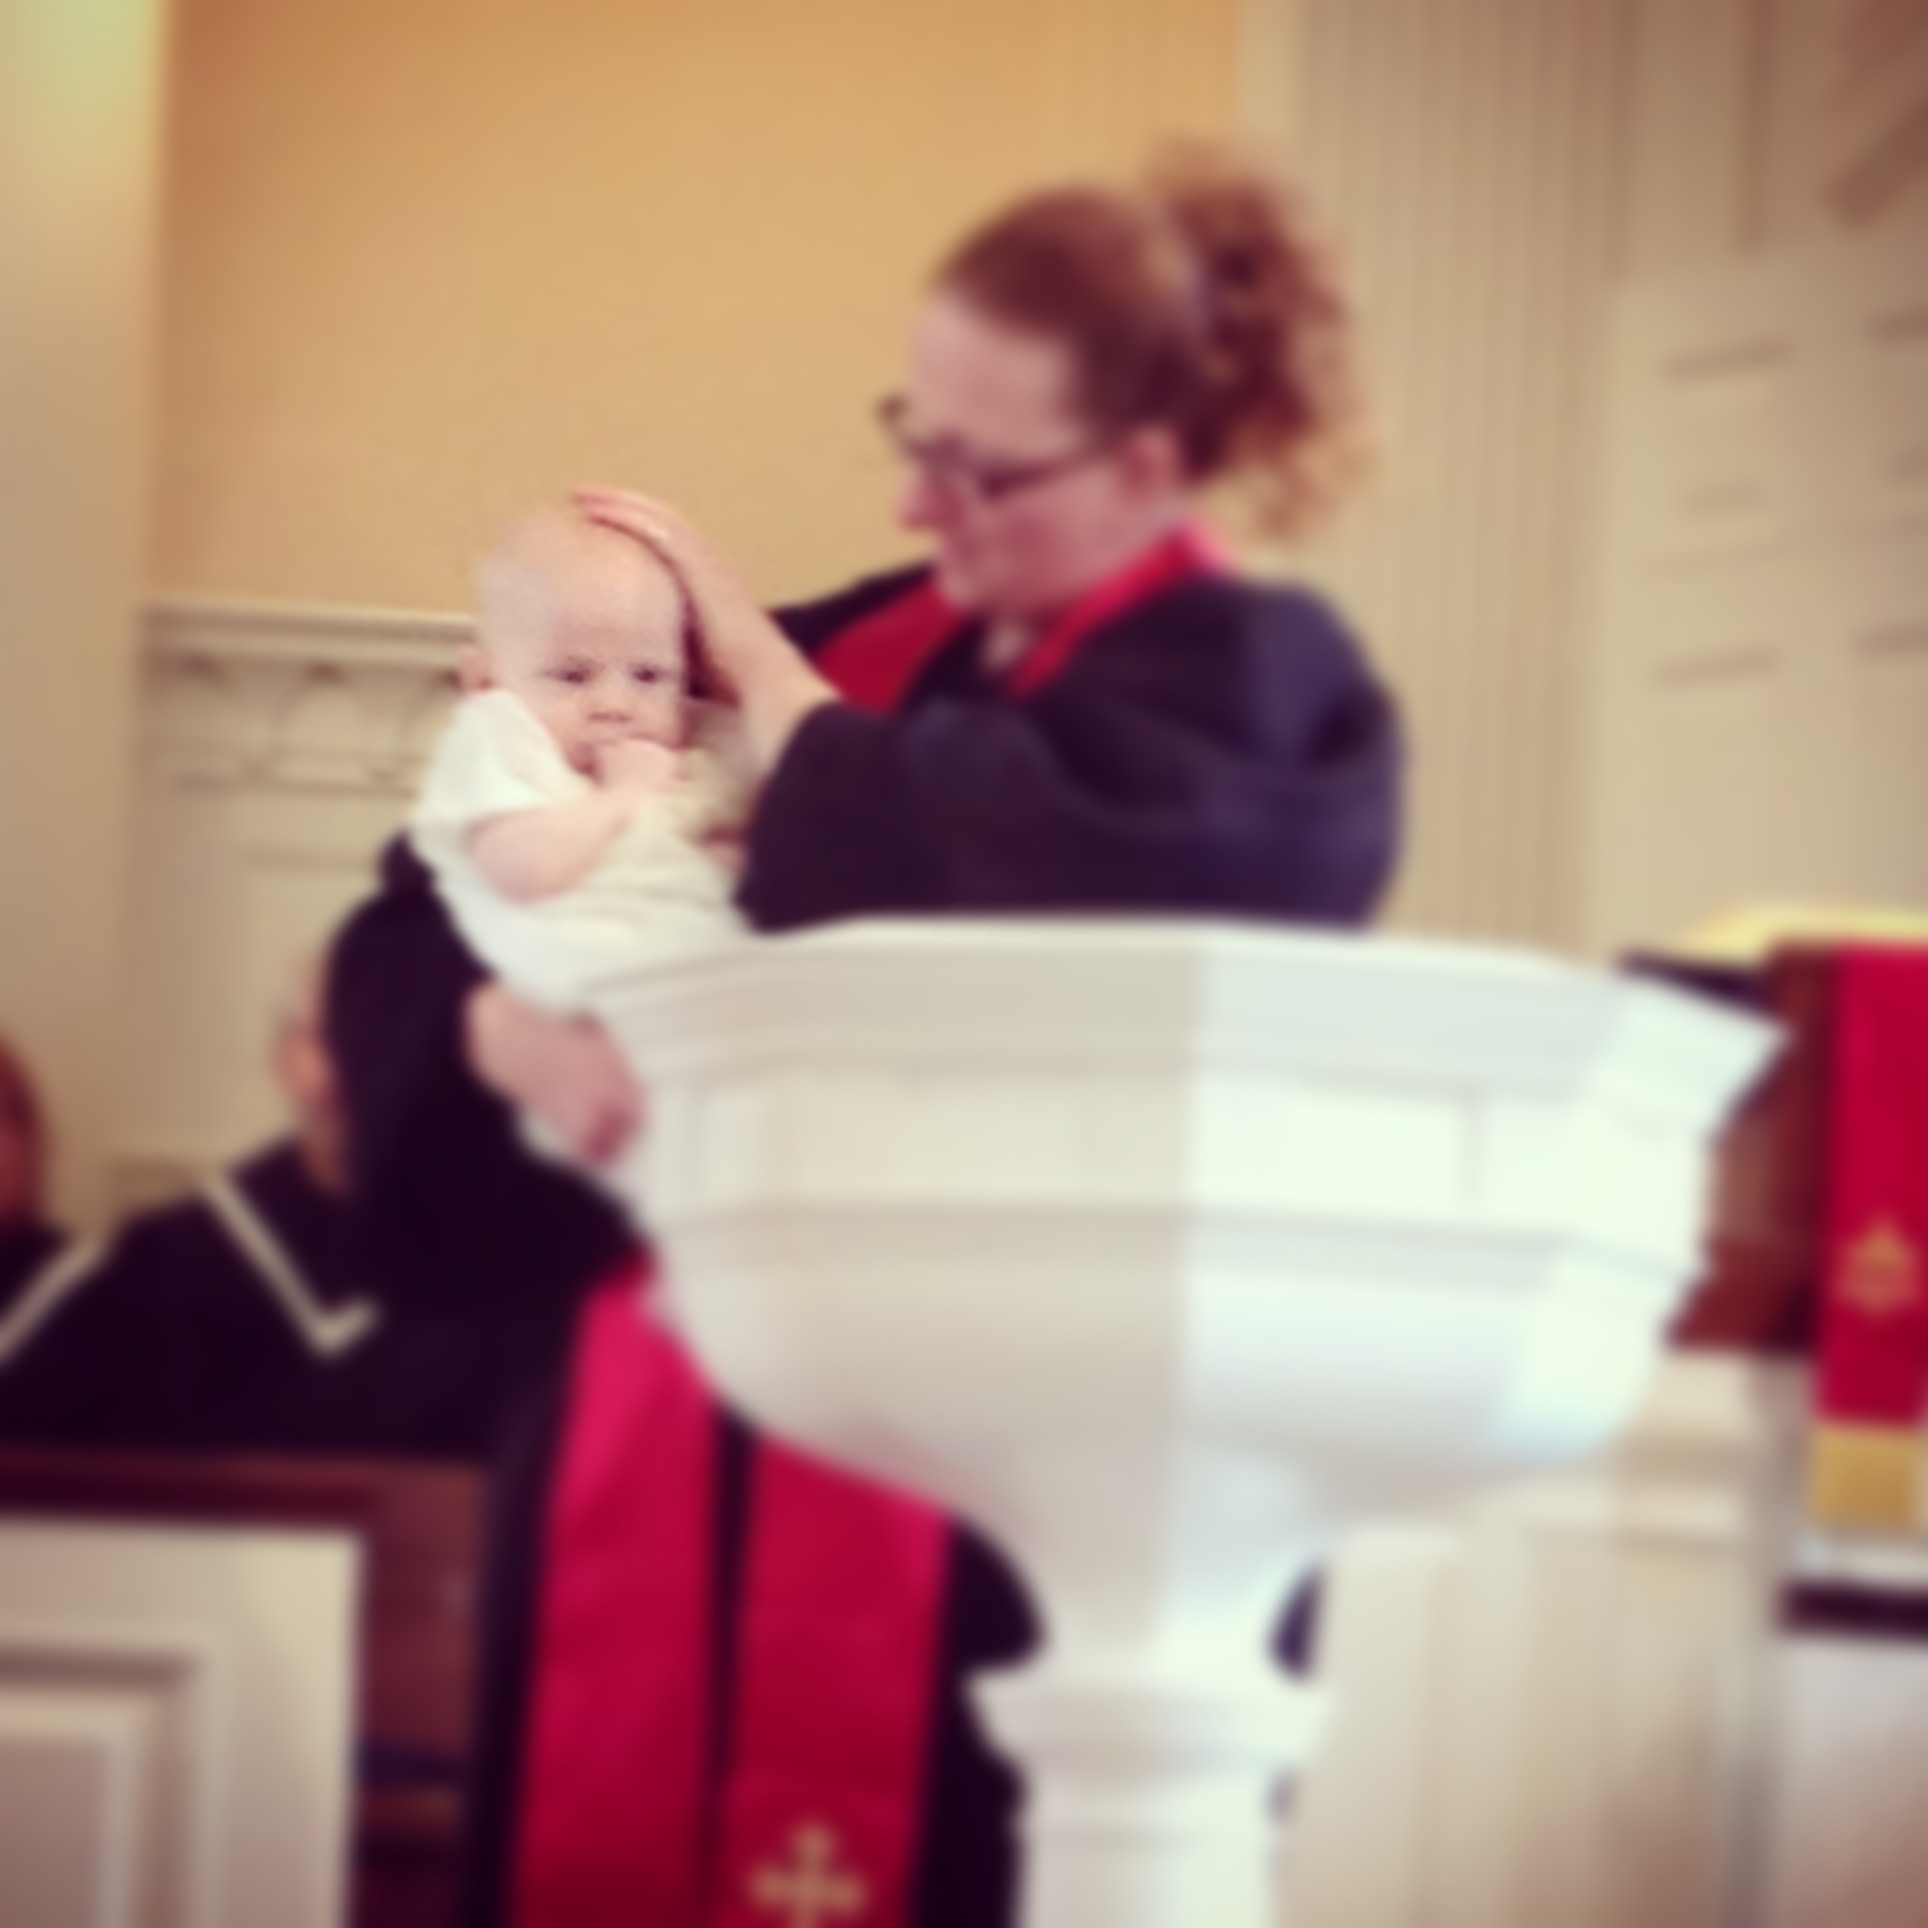 Do children baptize in the post 95